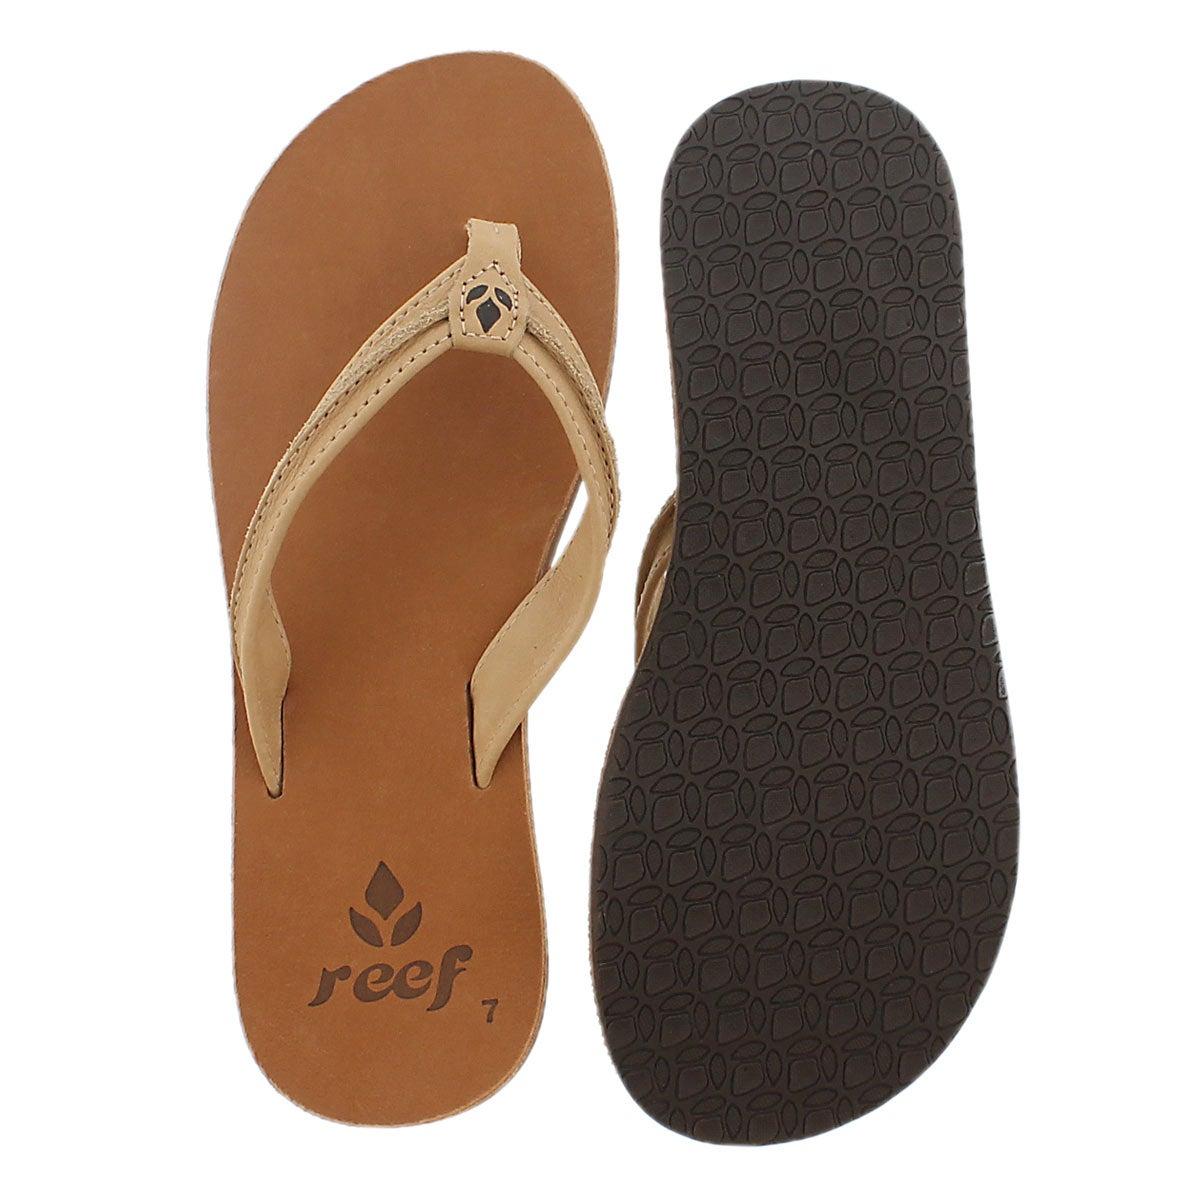 Sandale tong Swing 2, havane/brun, fem